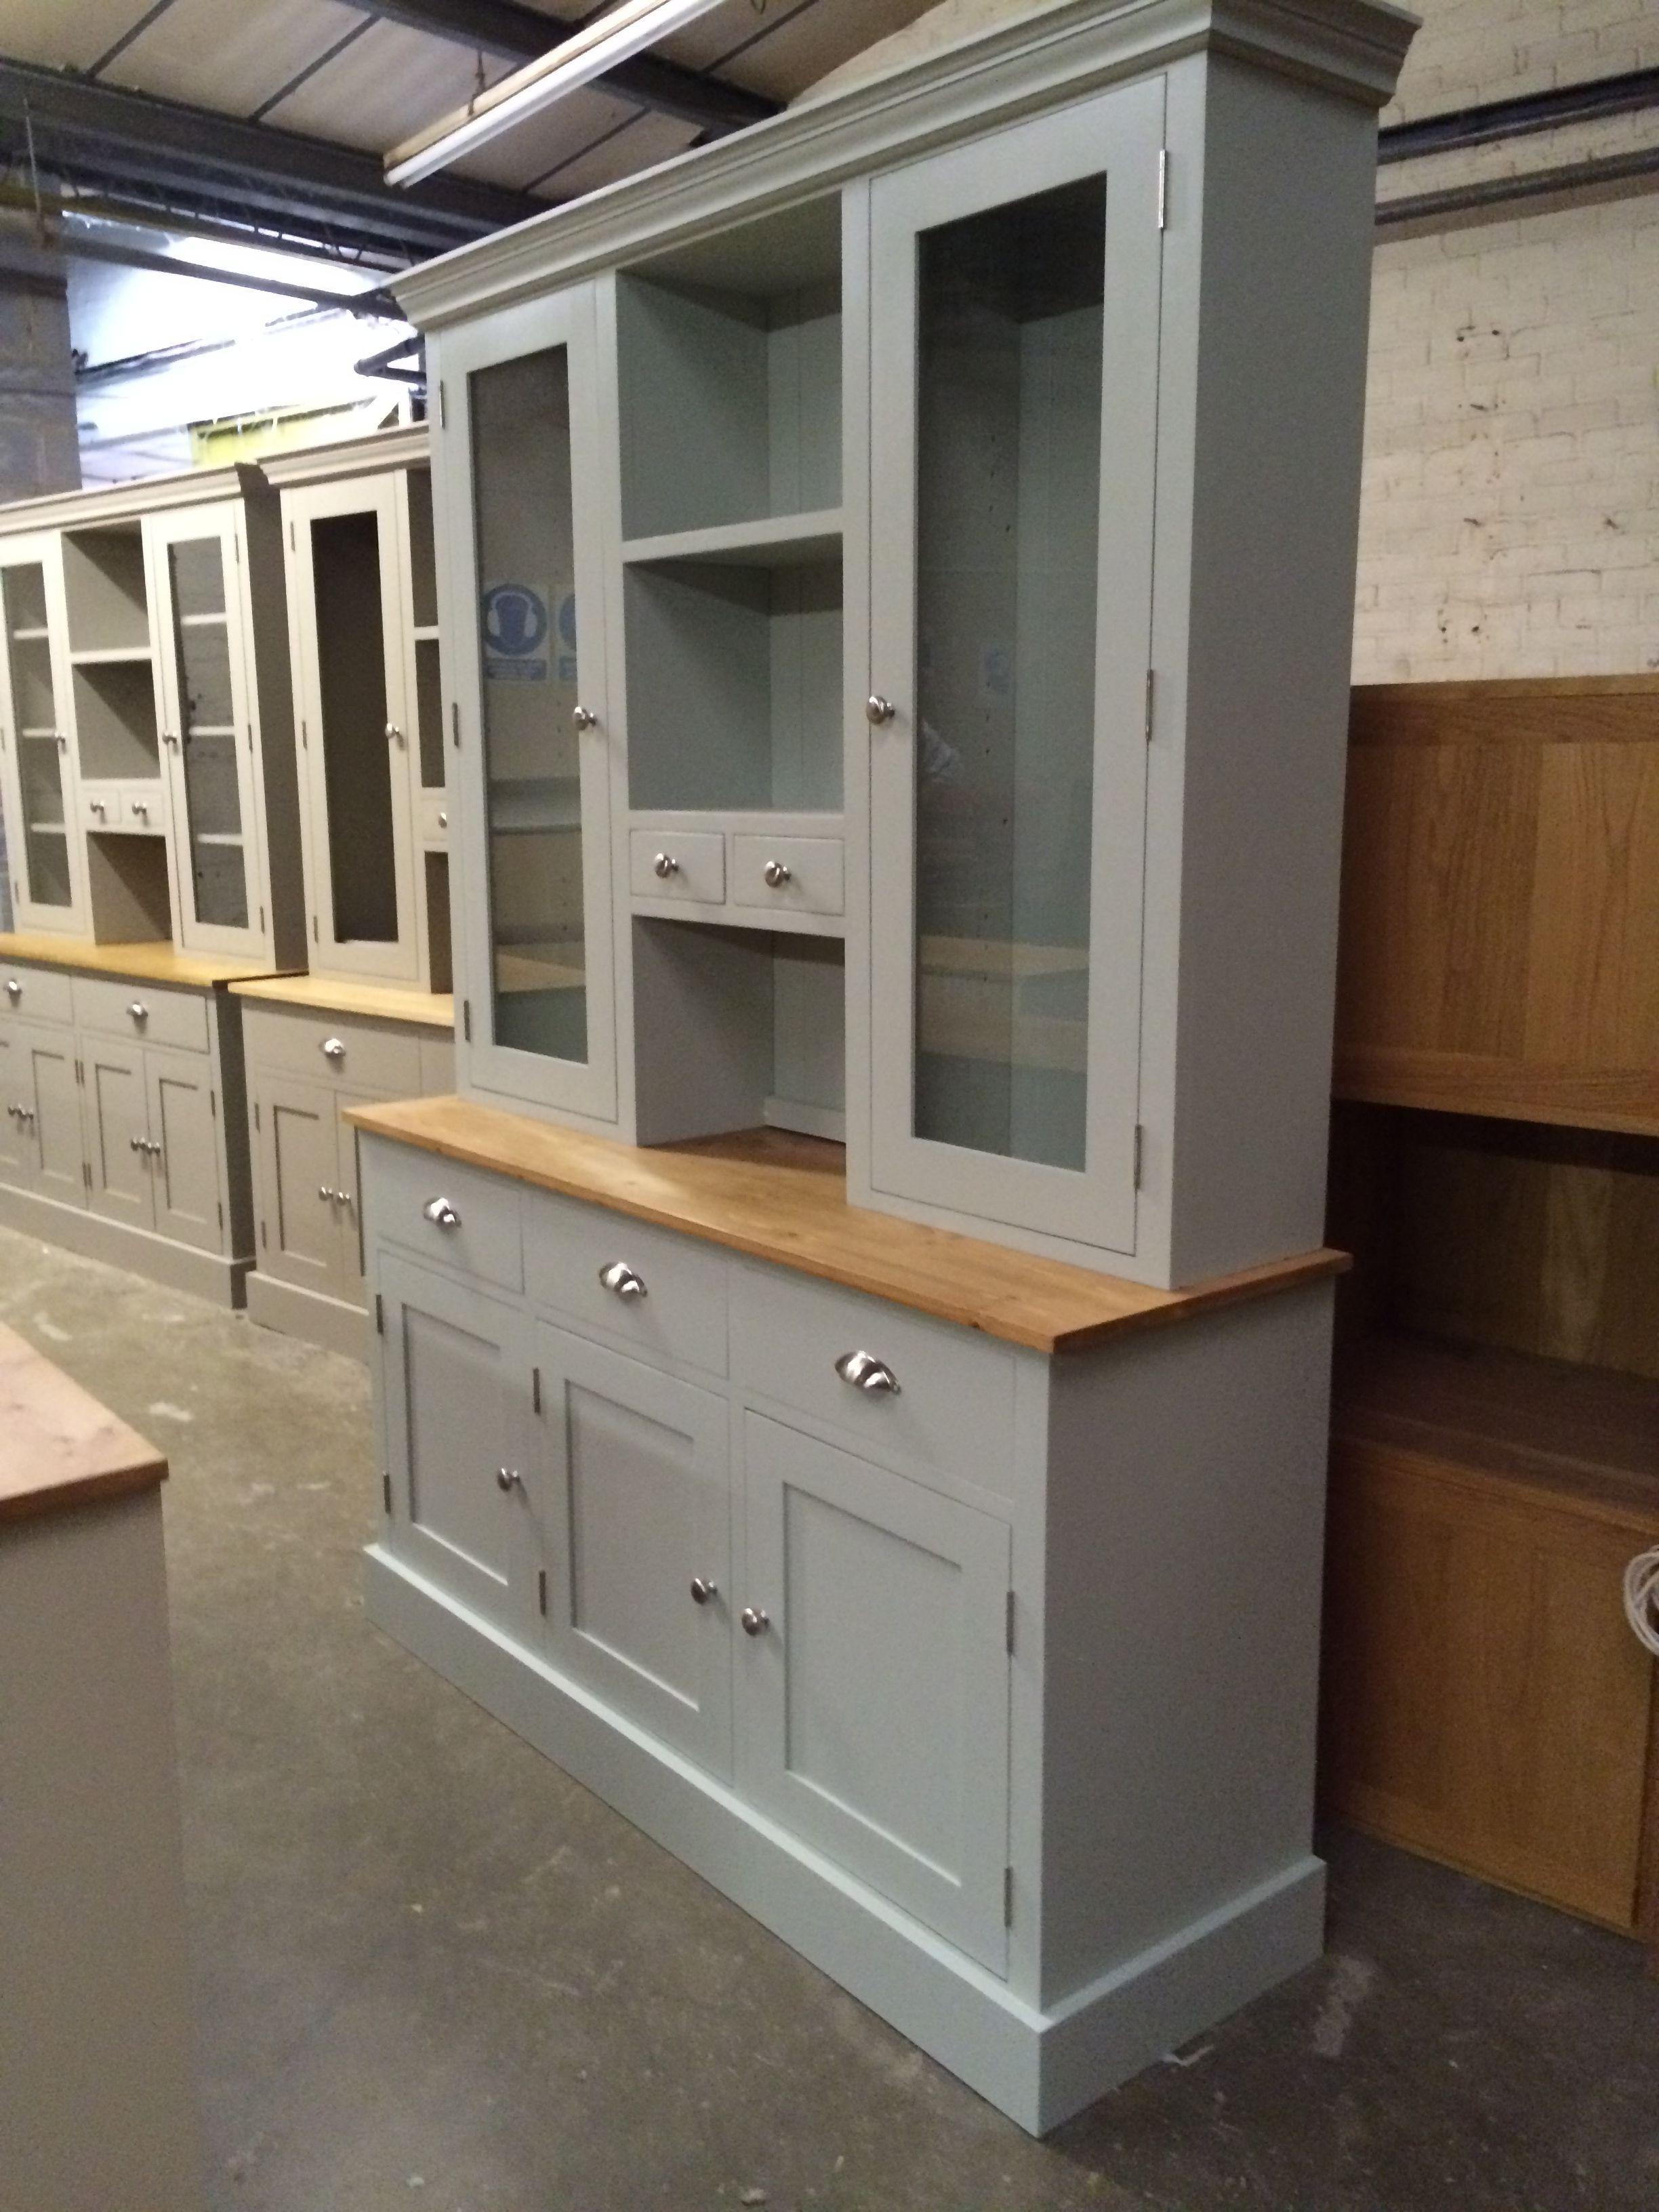 5 Dresser Painted F B Parma Gray